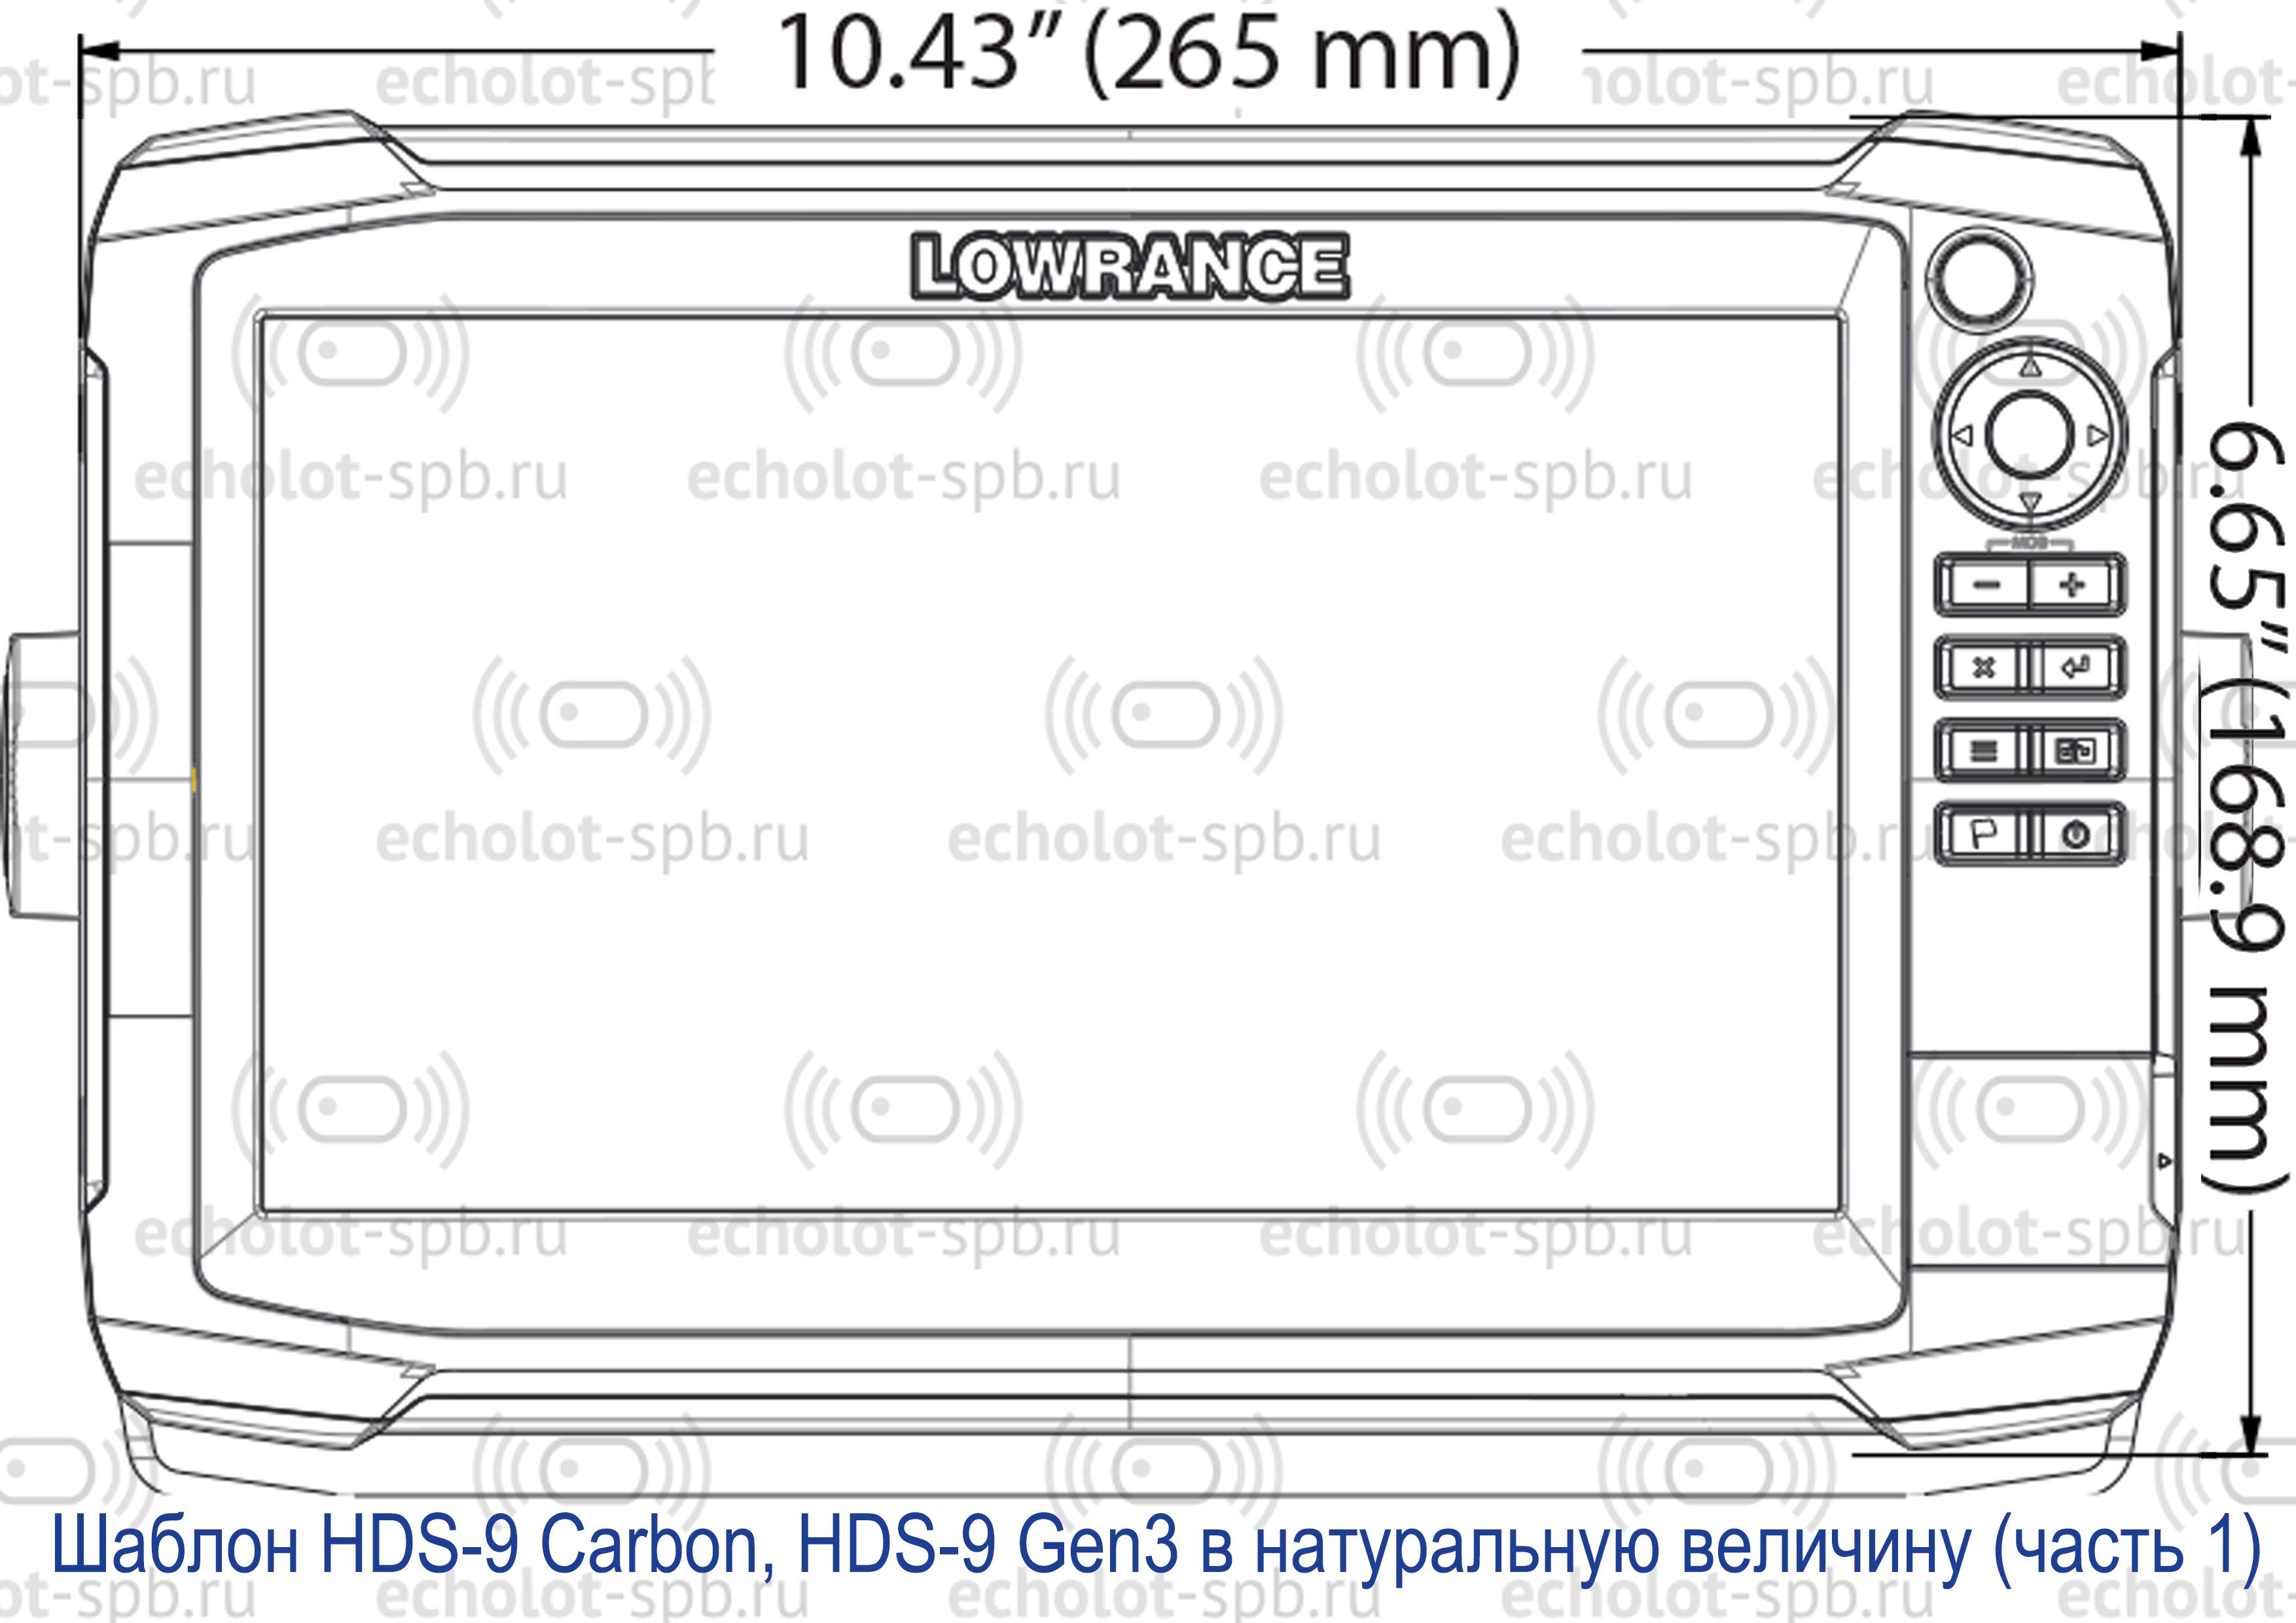 https://static-sl.insales.ru/files/1/643/5022339/original/HDS-09_01.jpg